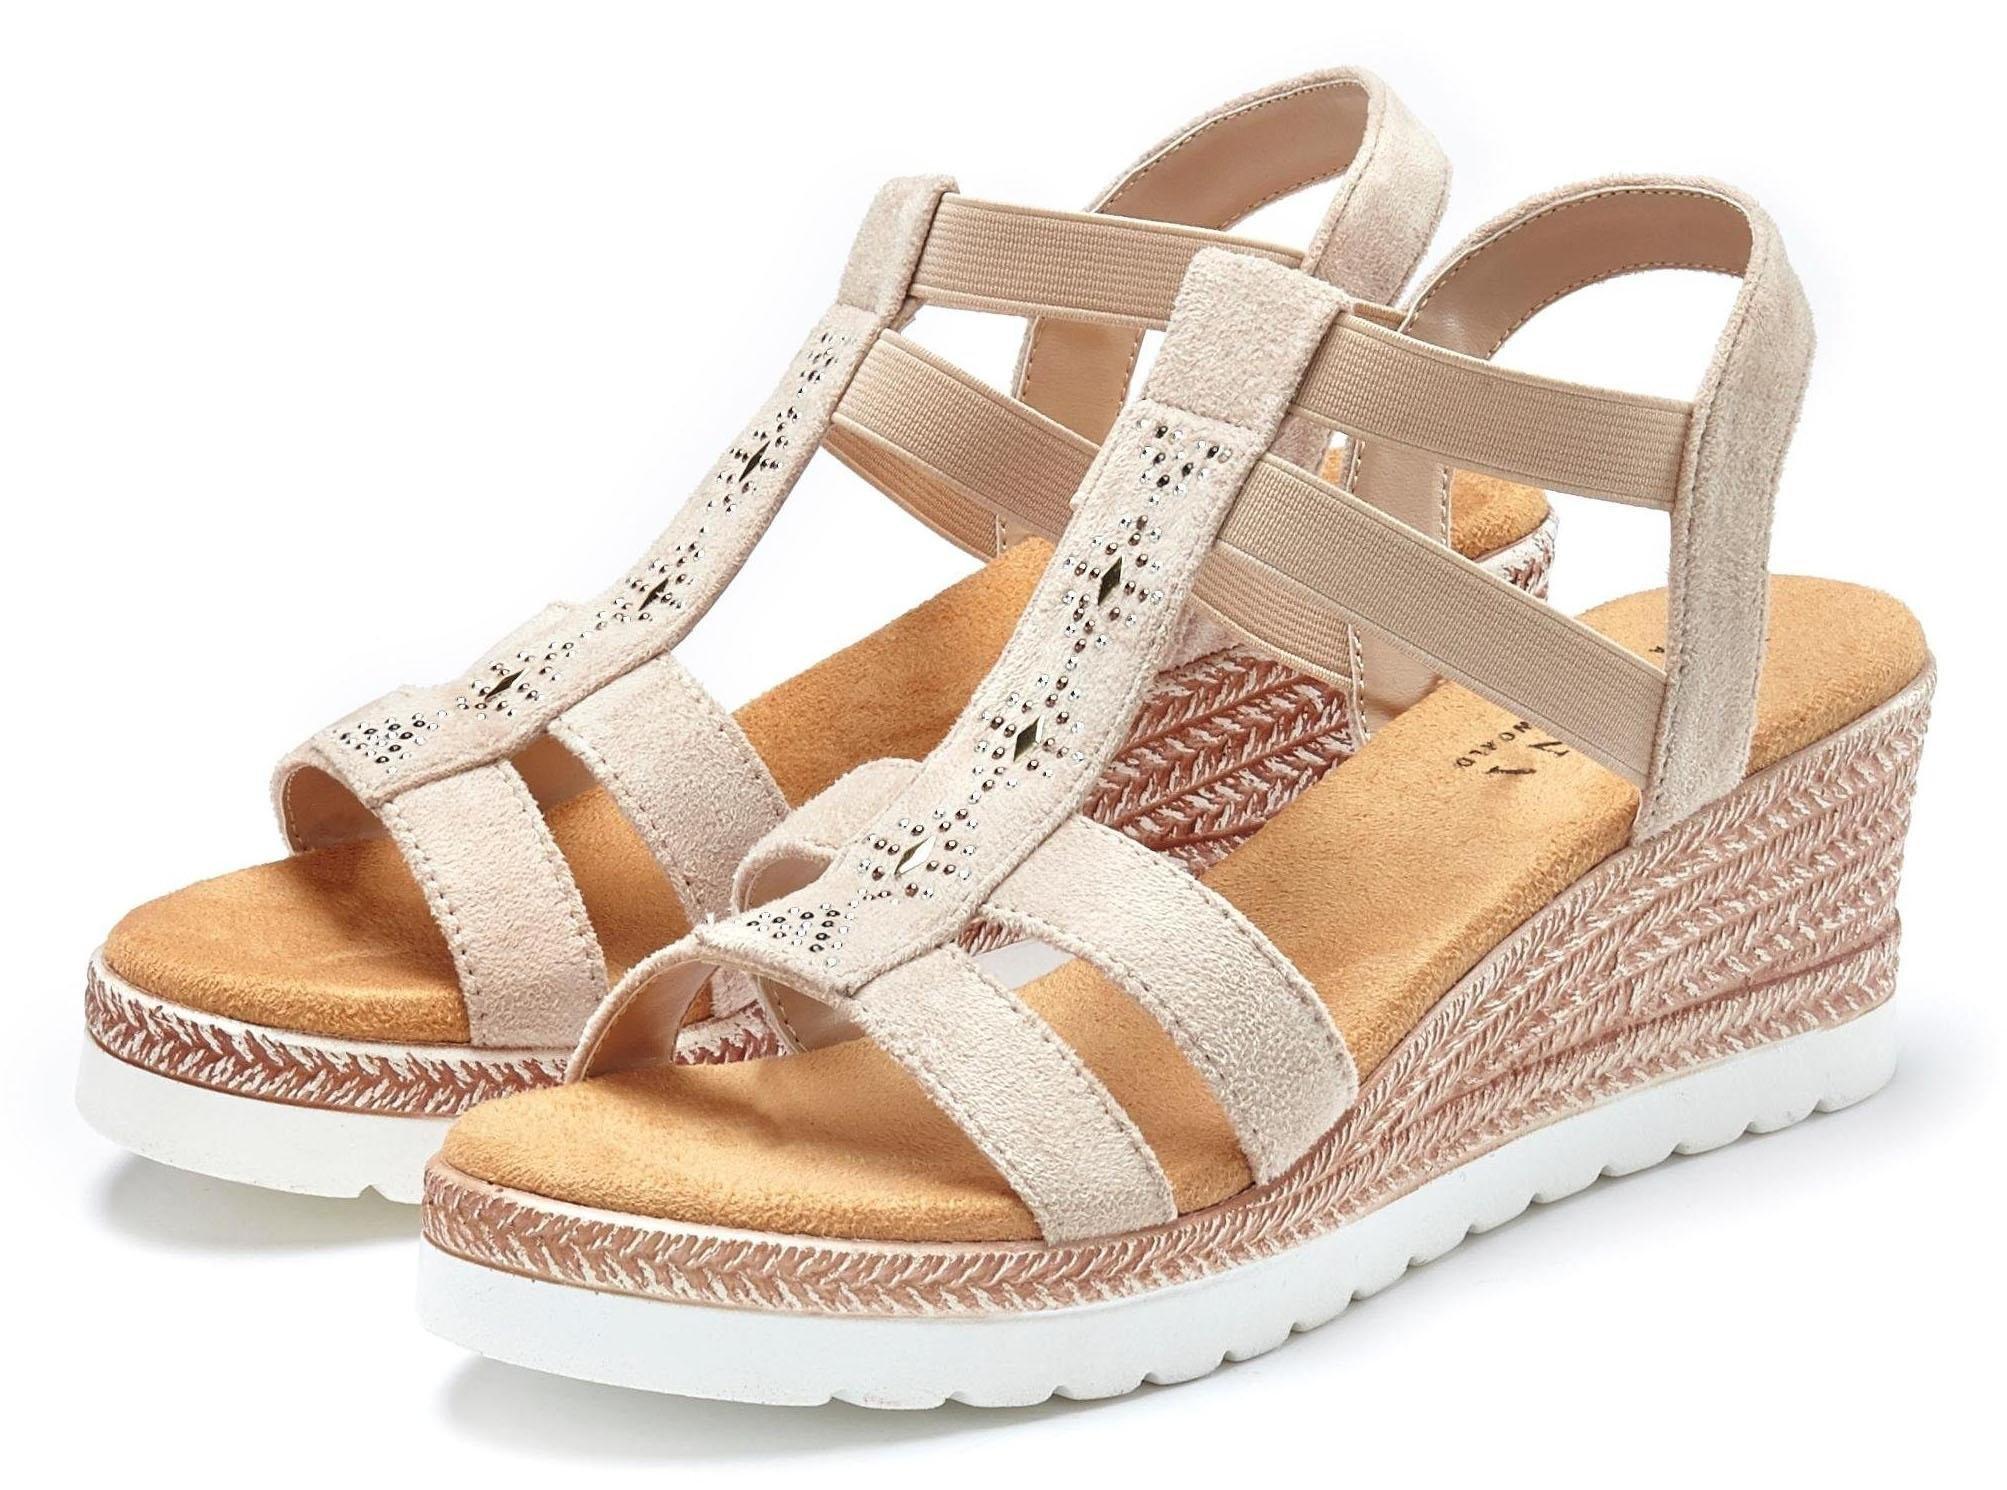 LASCANA sandaaltjes online kopen op otto.nl